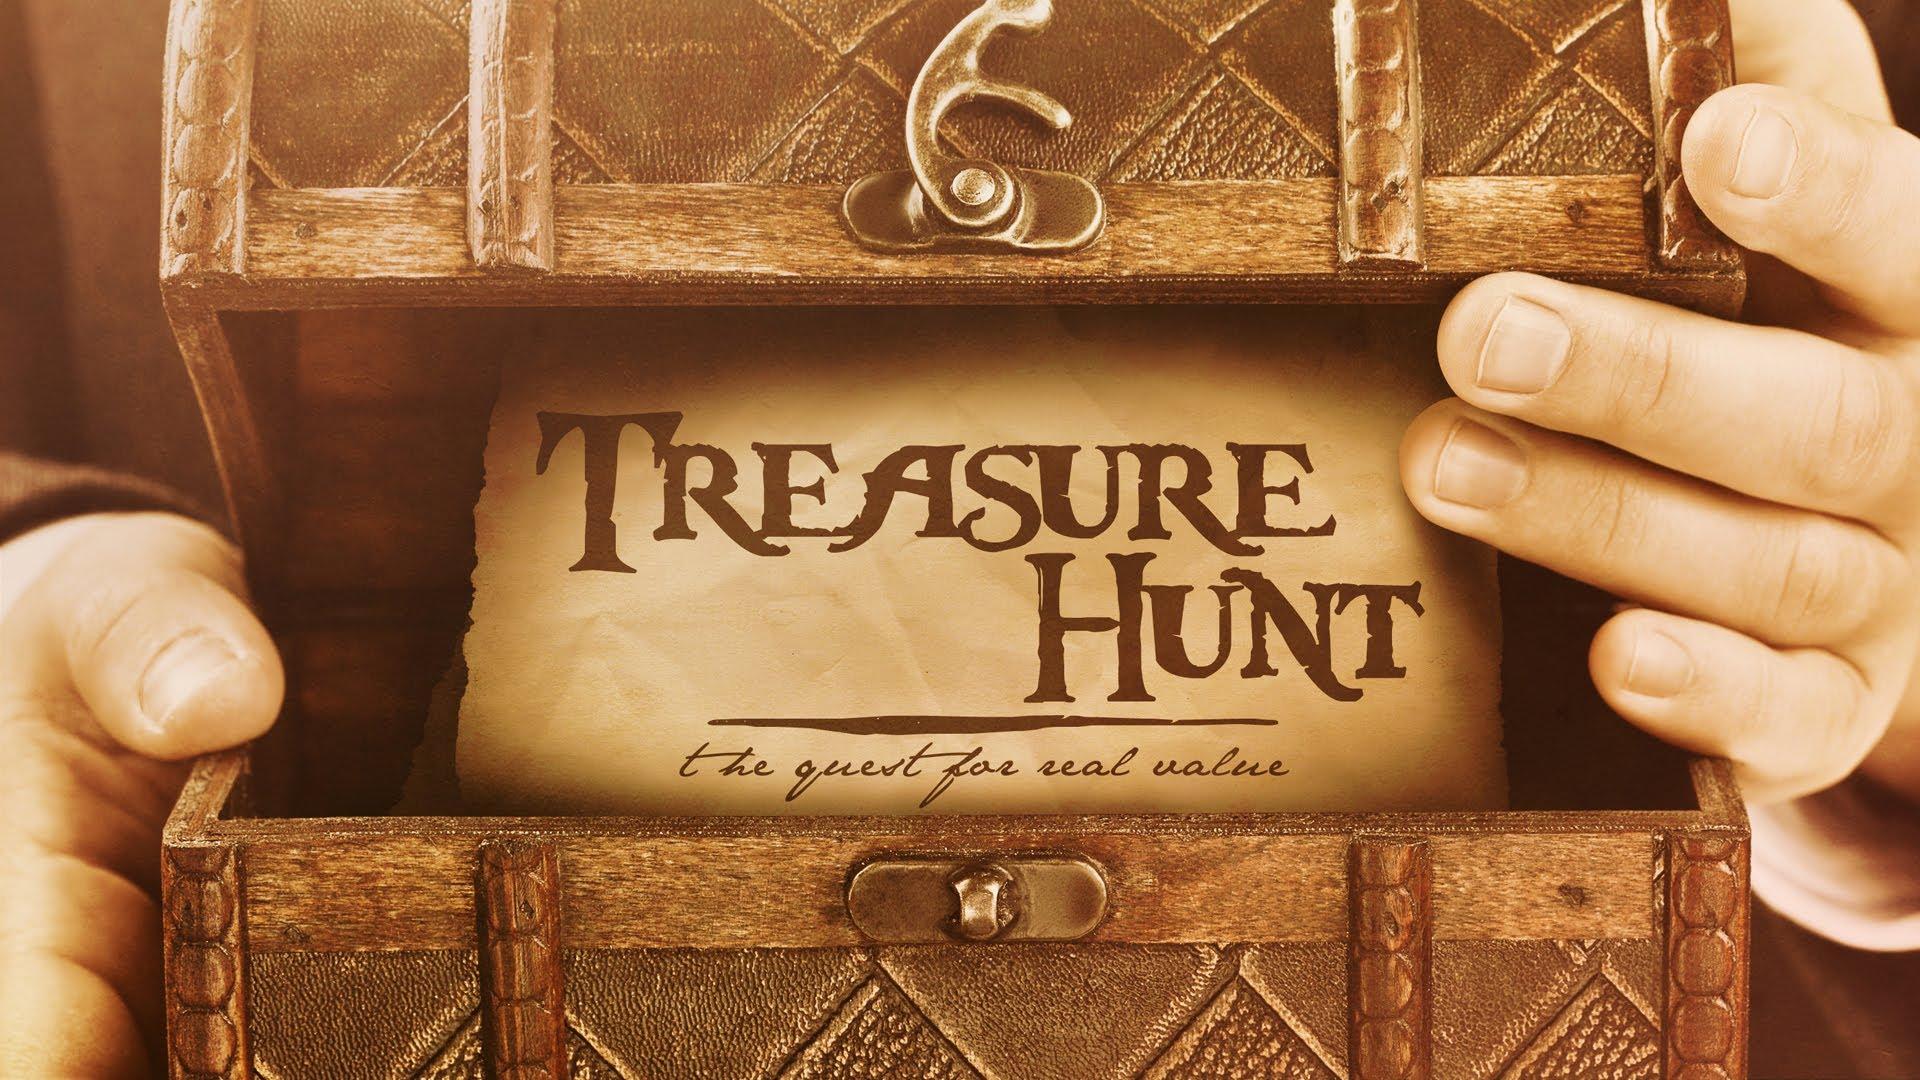 Treasure Hunt (film)